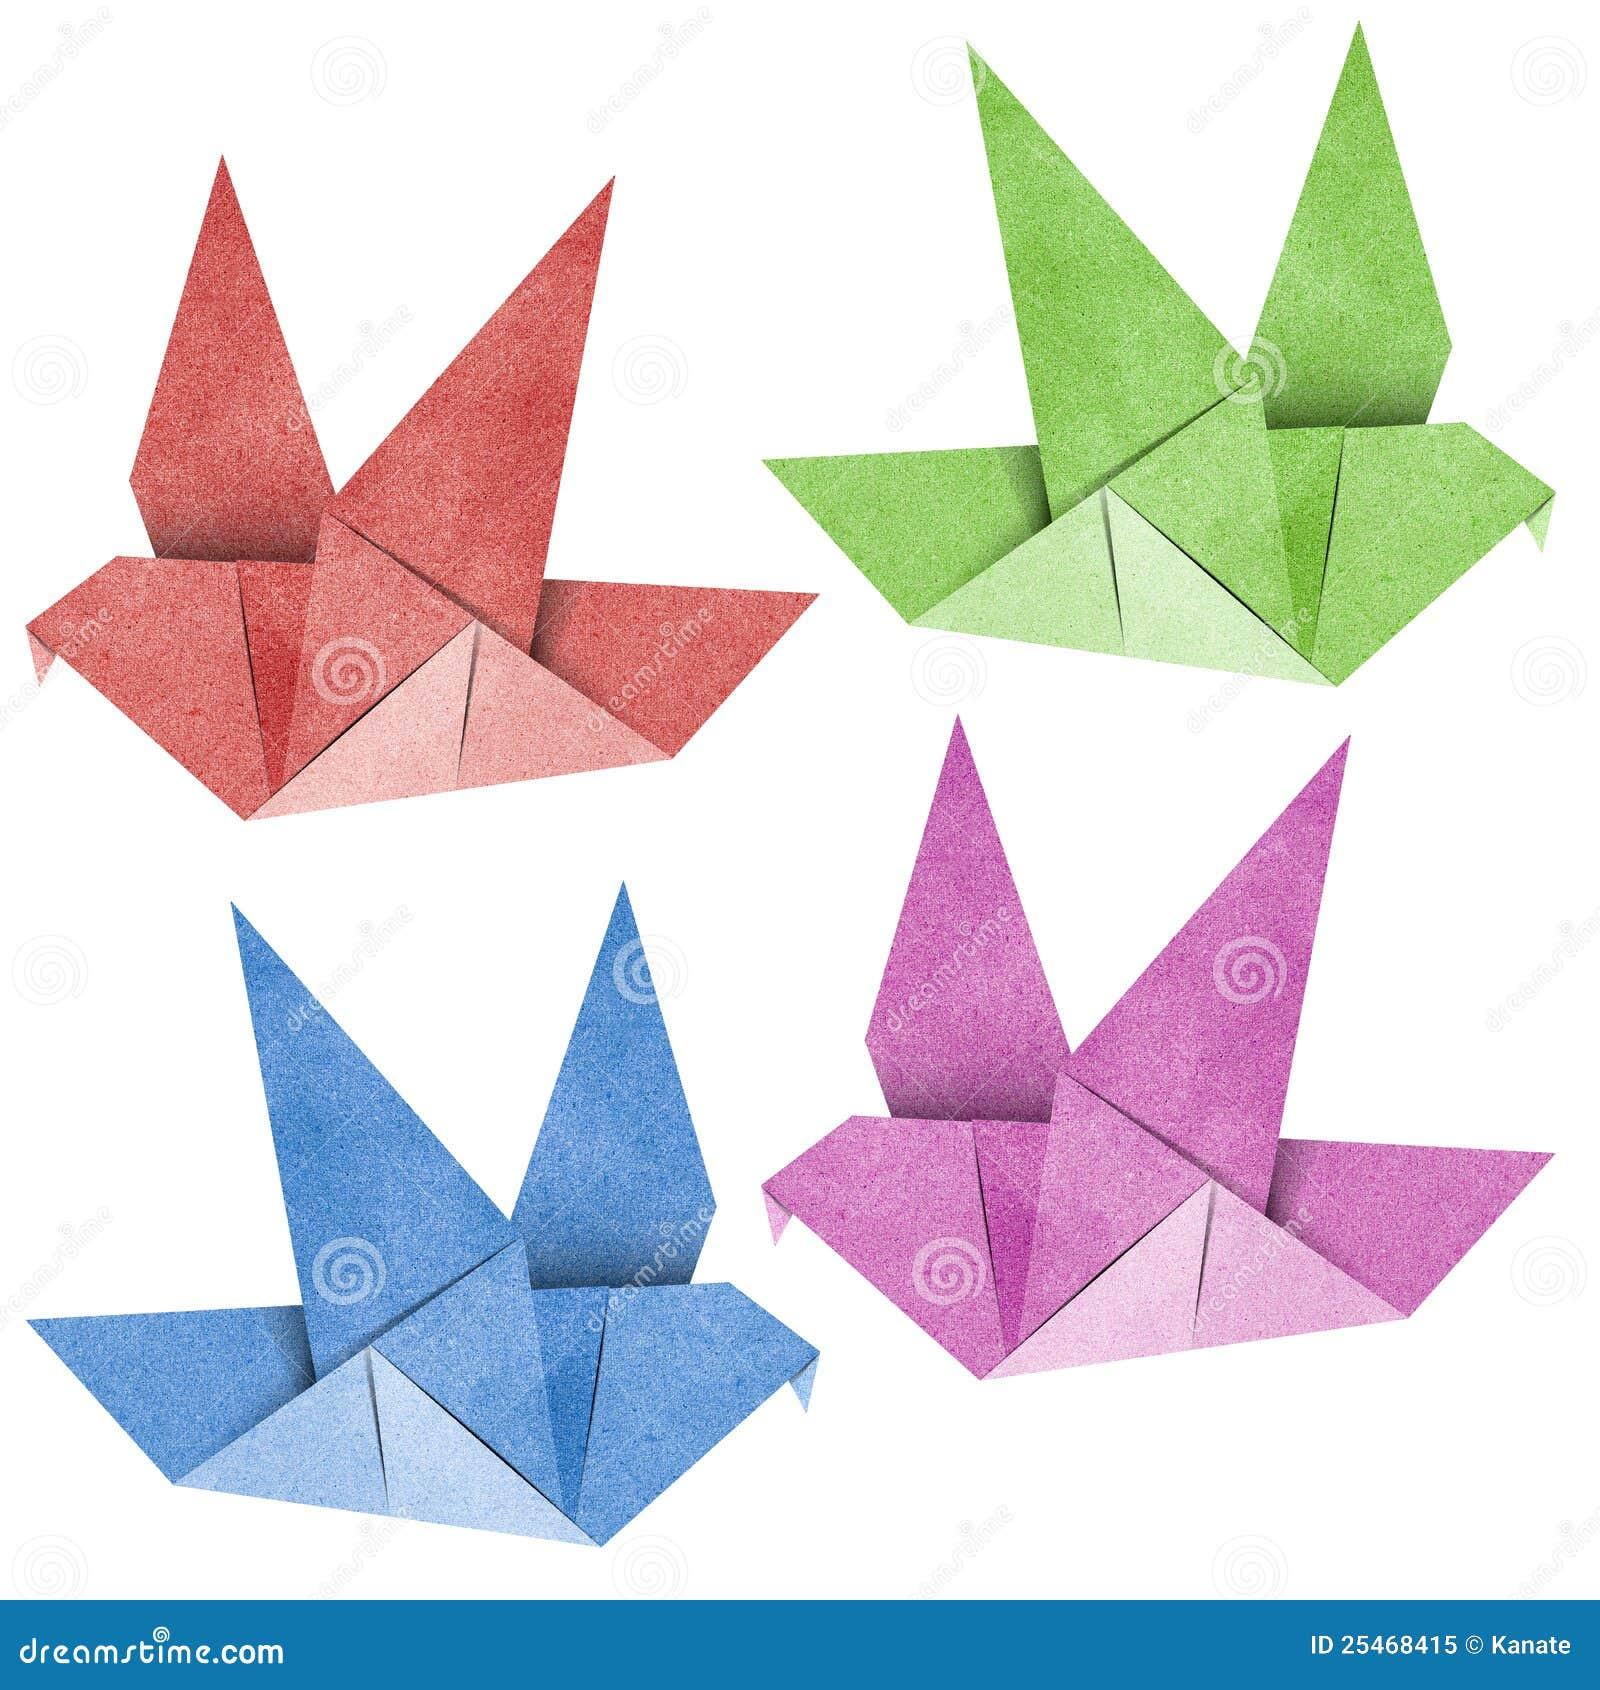 Origami Bird Recycled Papercraft Stock Illustration ... - photo#30